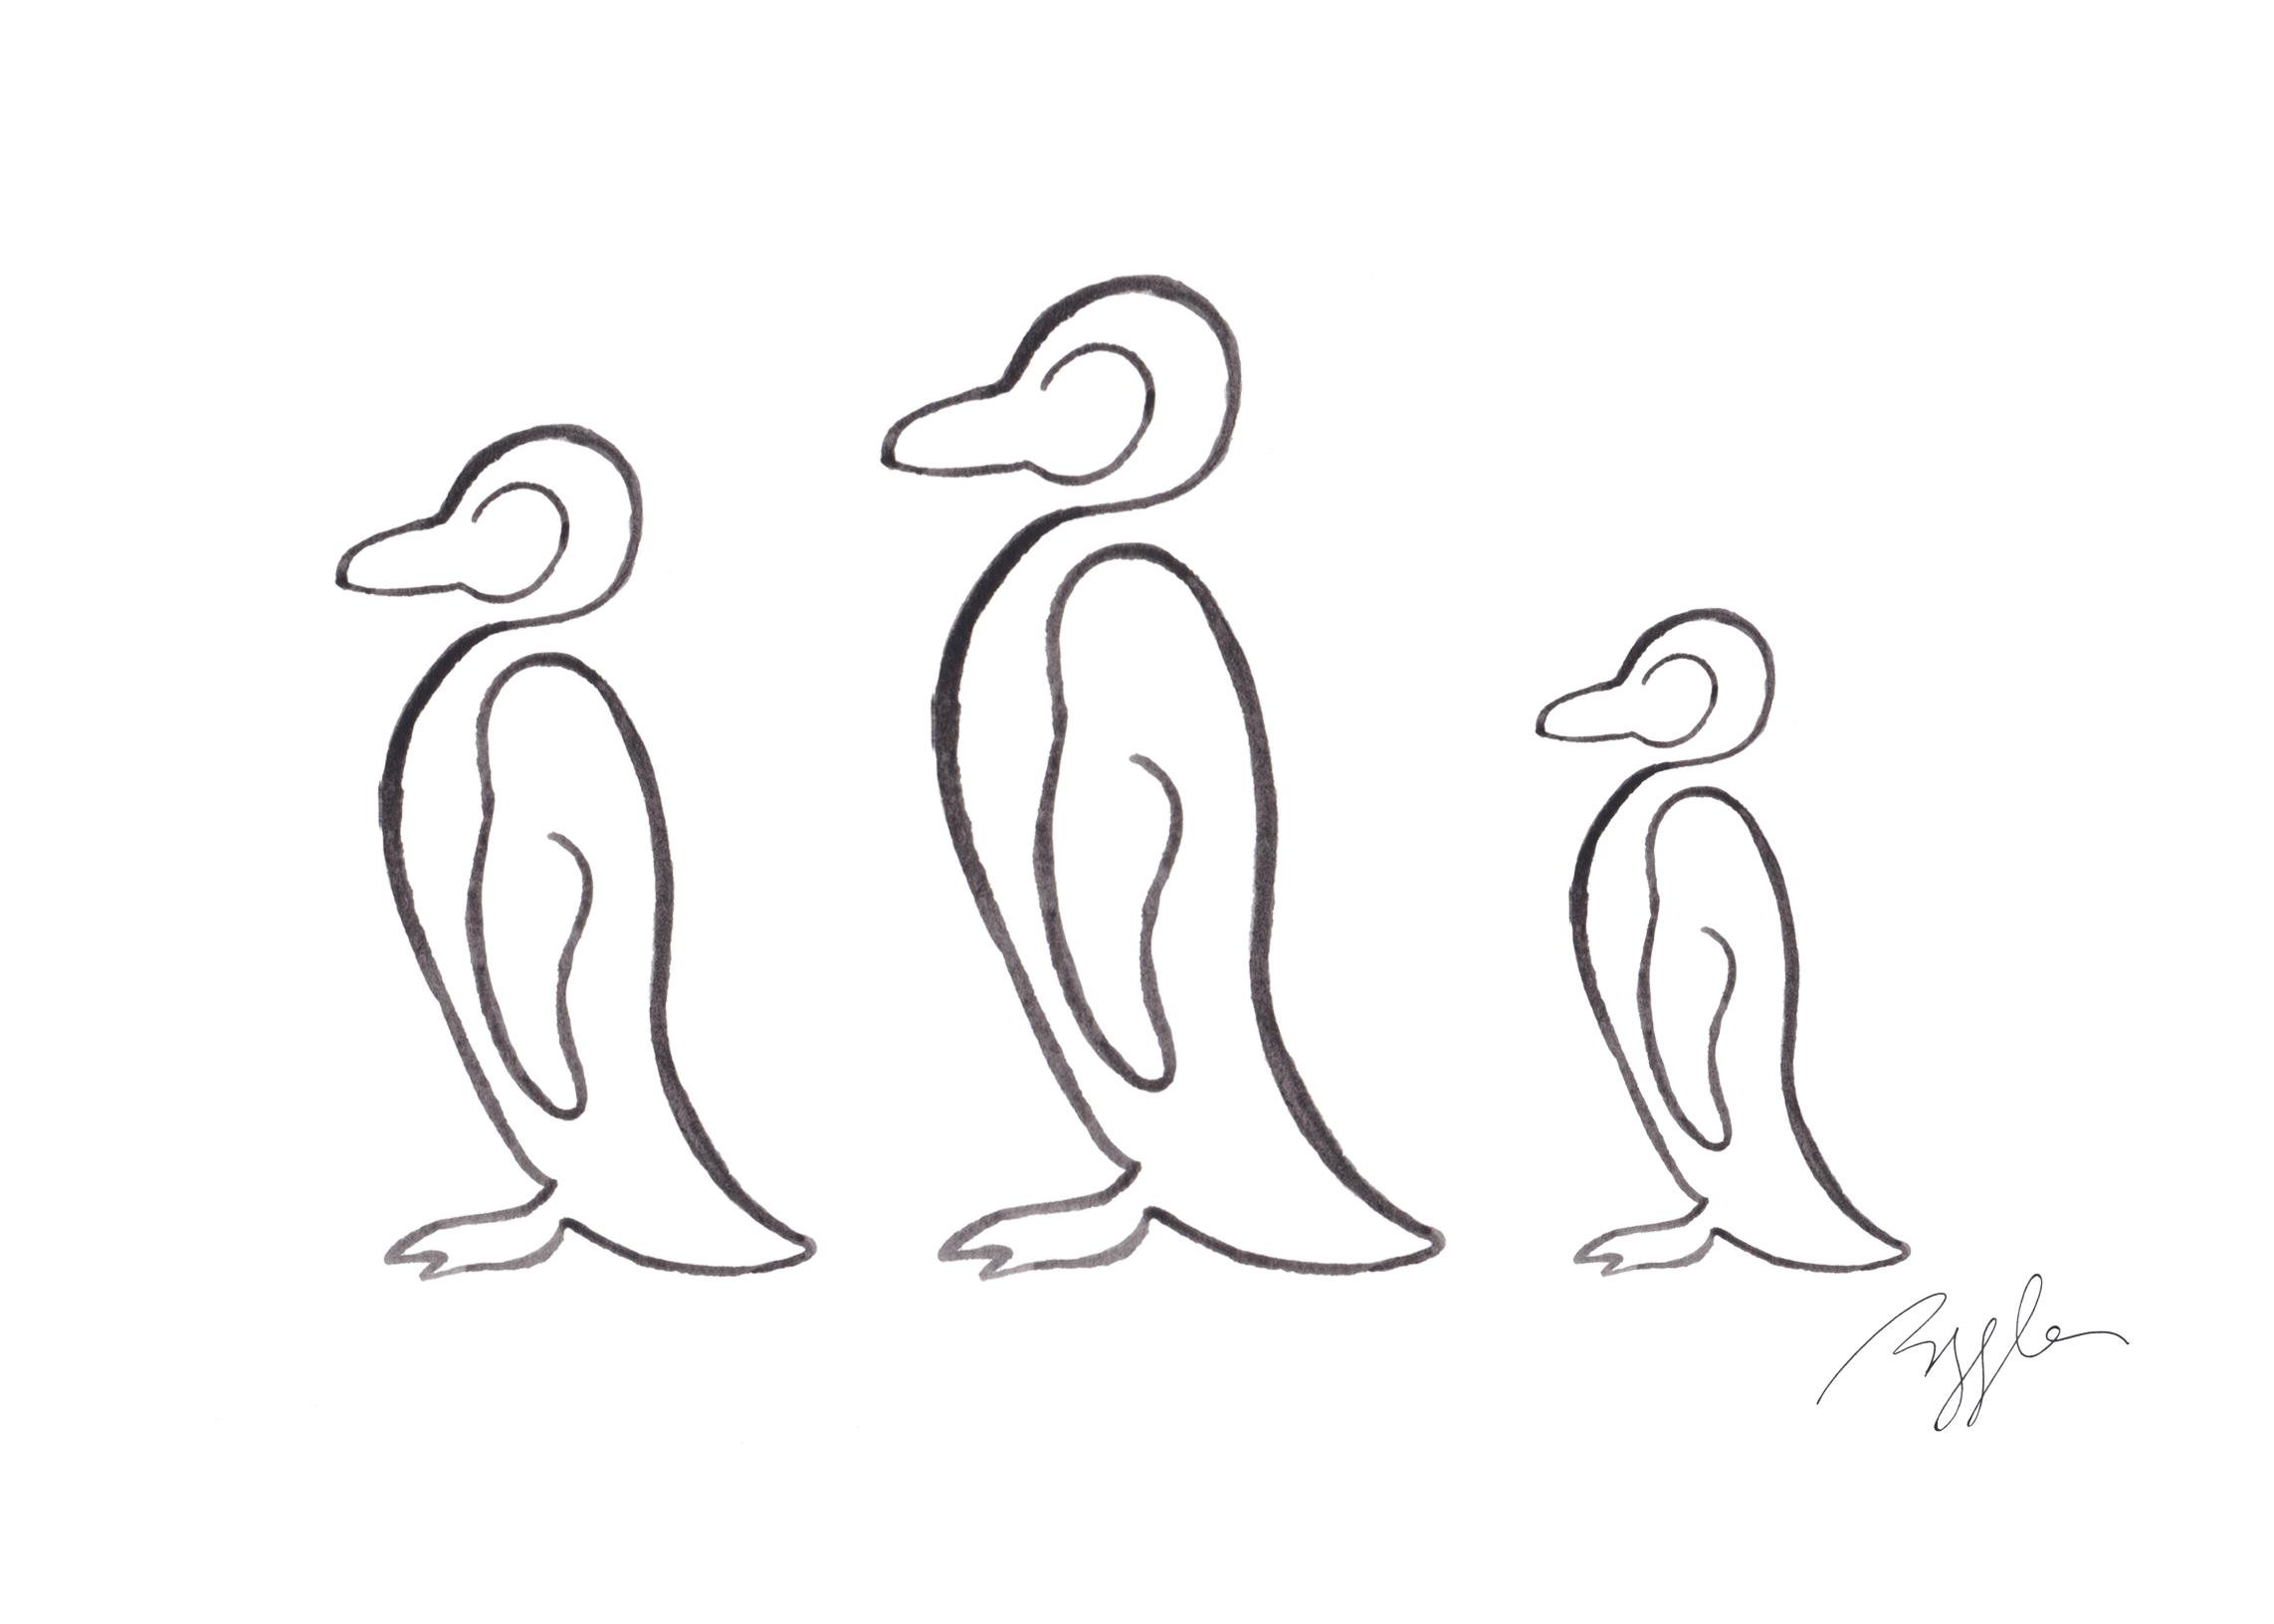 Brazzlebird - African Penguins Line Watercolor Painting.jpg